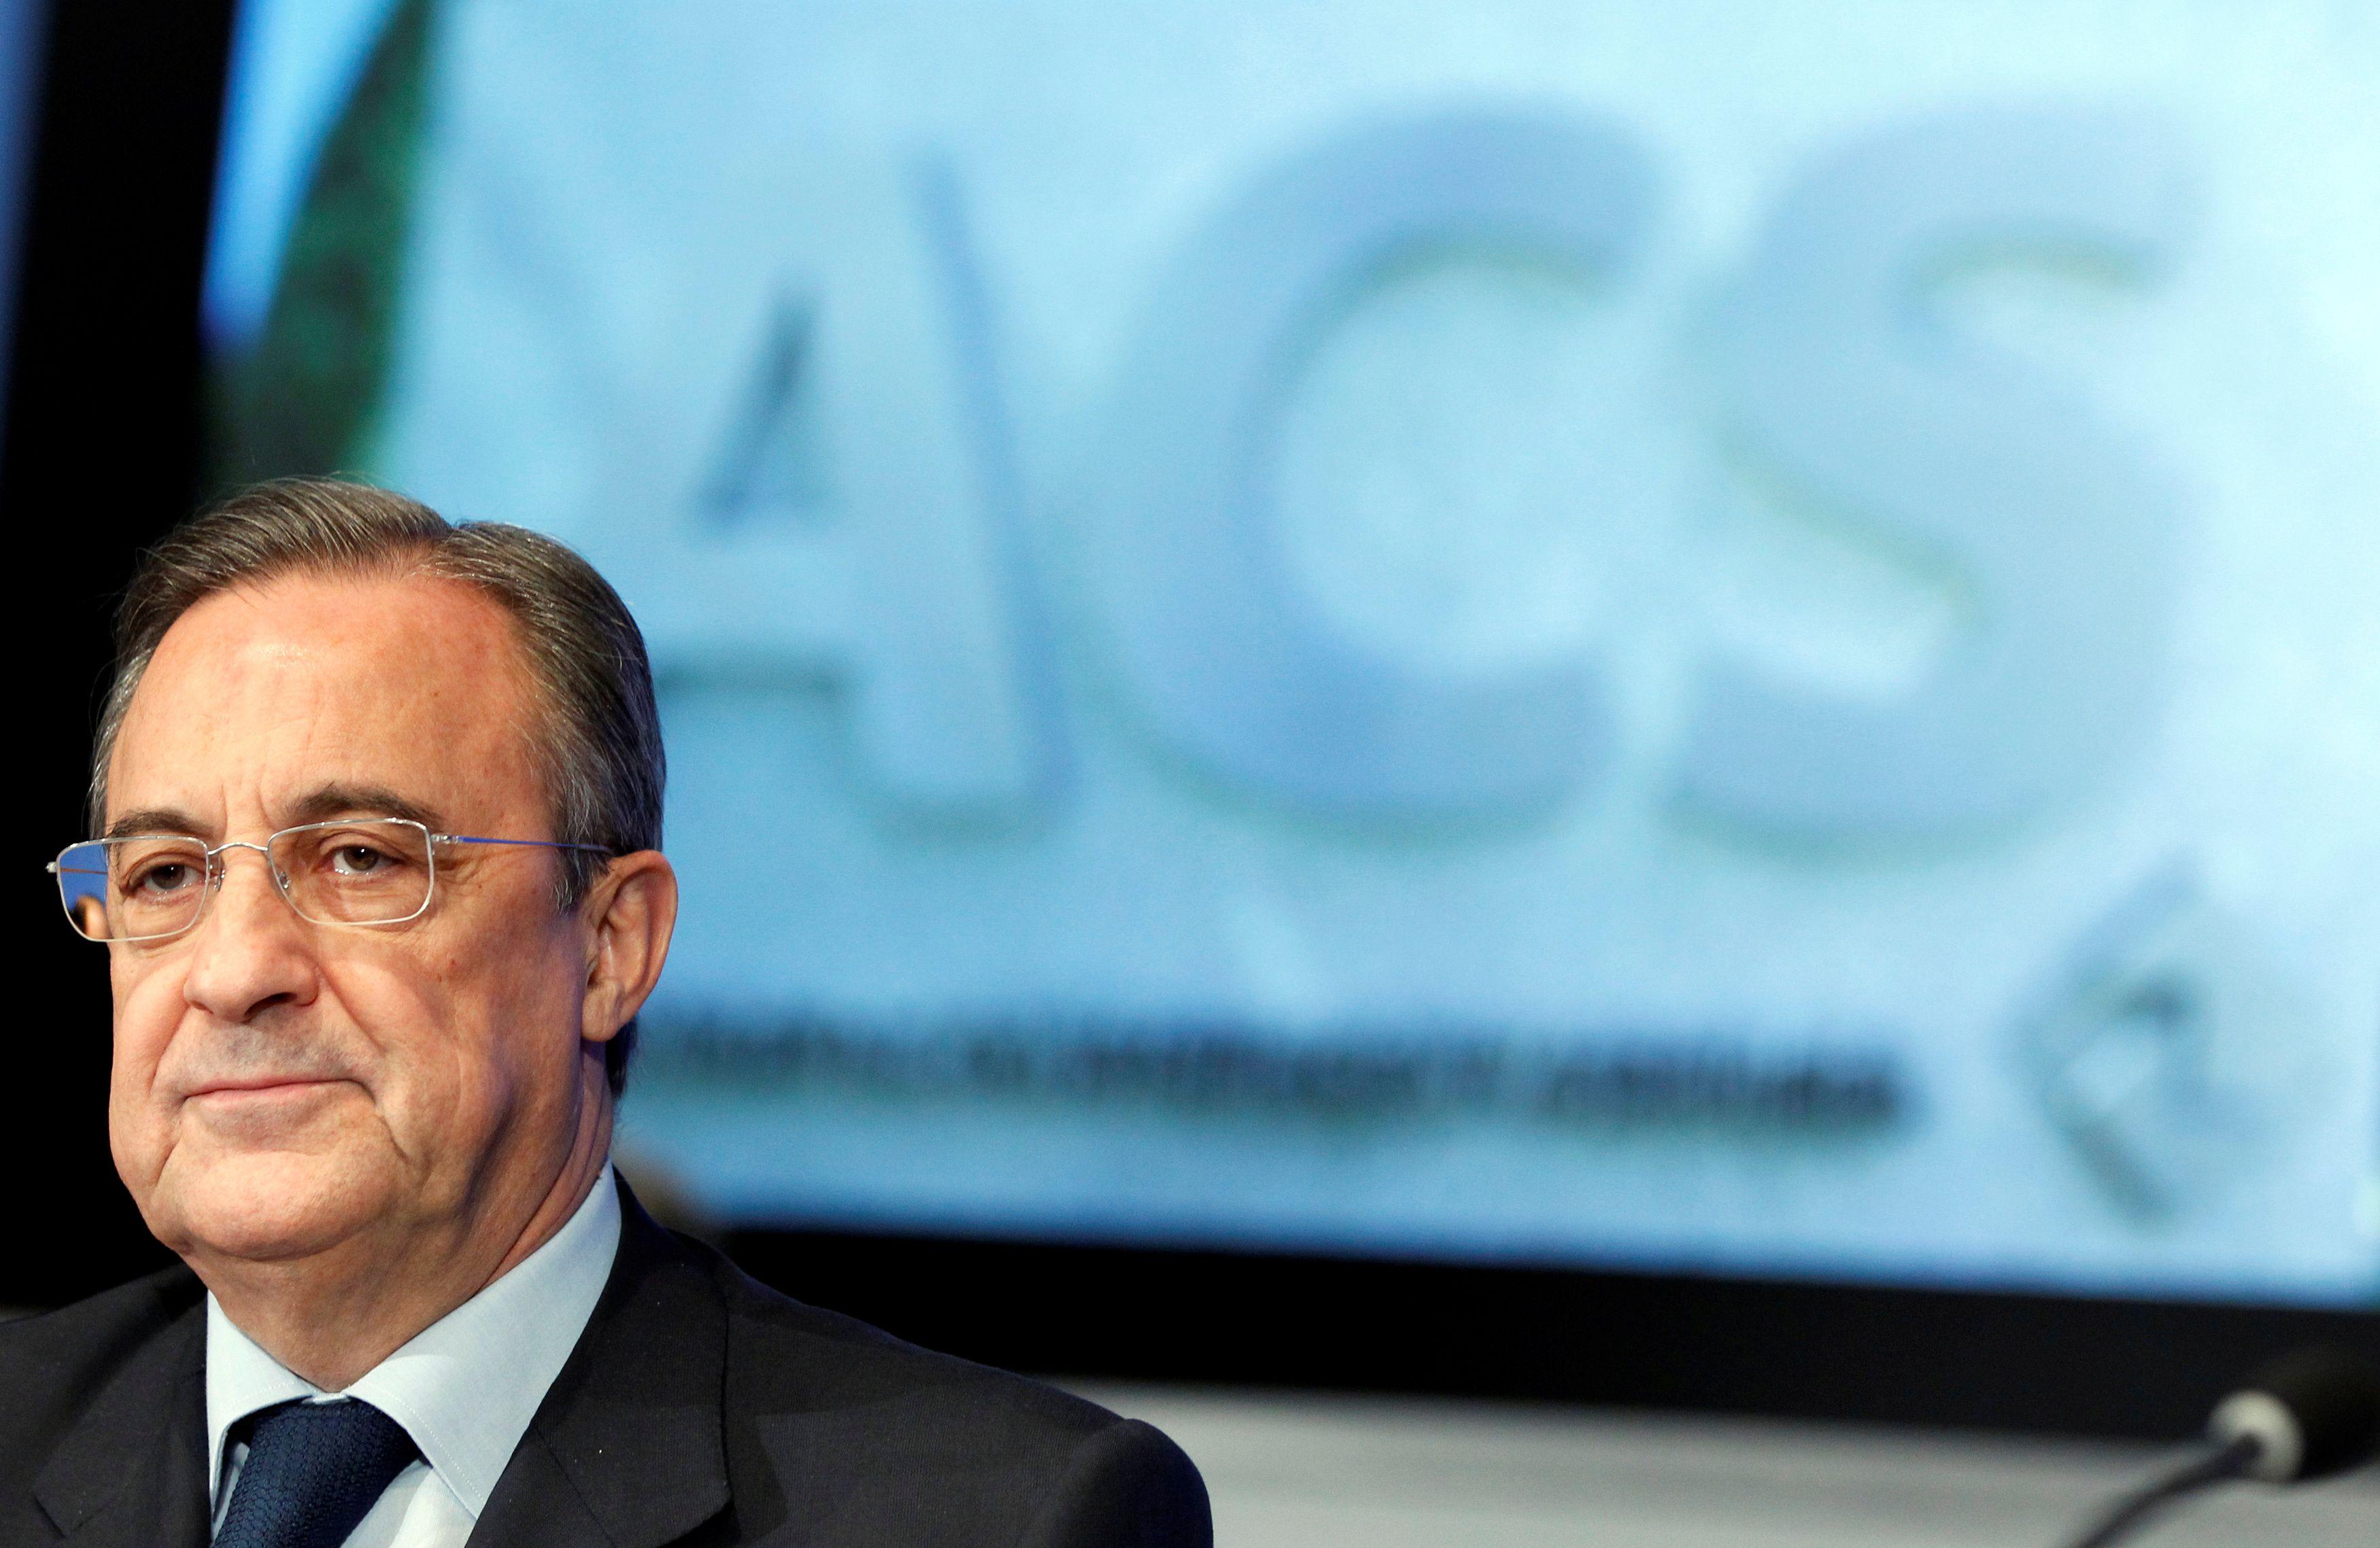 Florentino Pérez, presidente del Real Madrid y de la Superliga europea (REUTERS/Sergio Perez/File Photo)